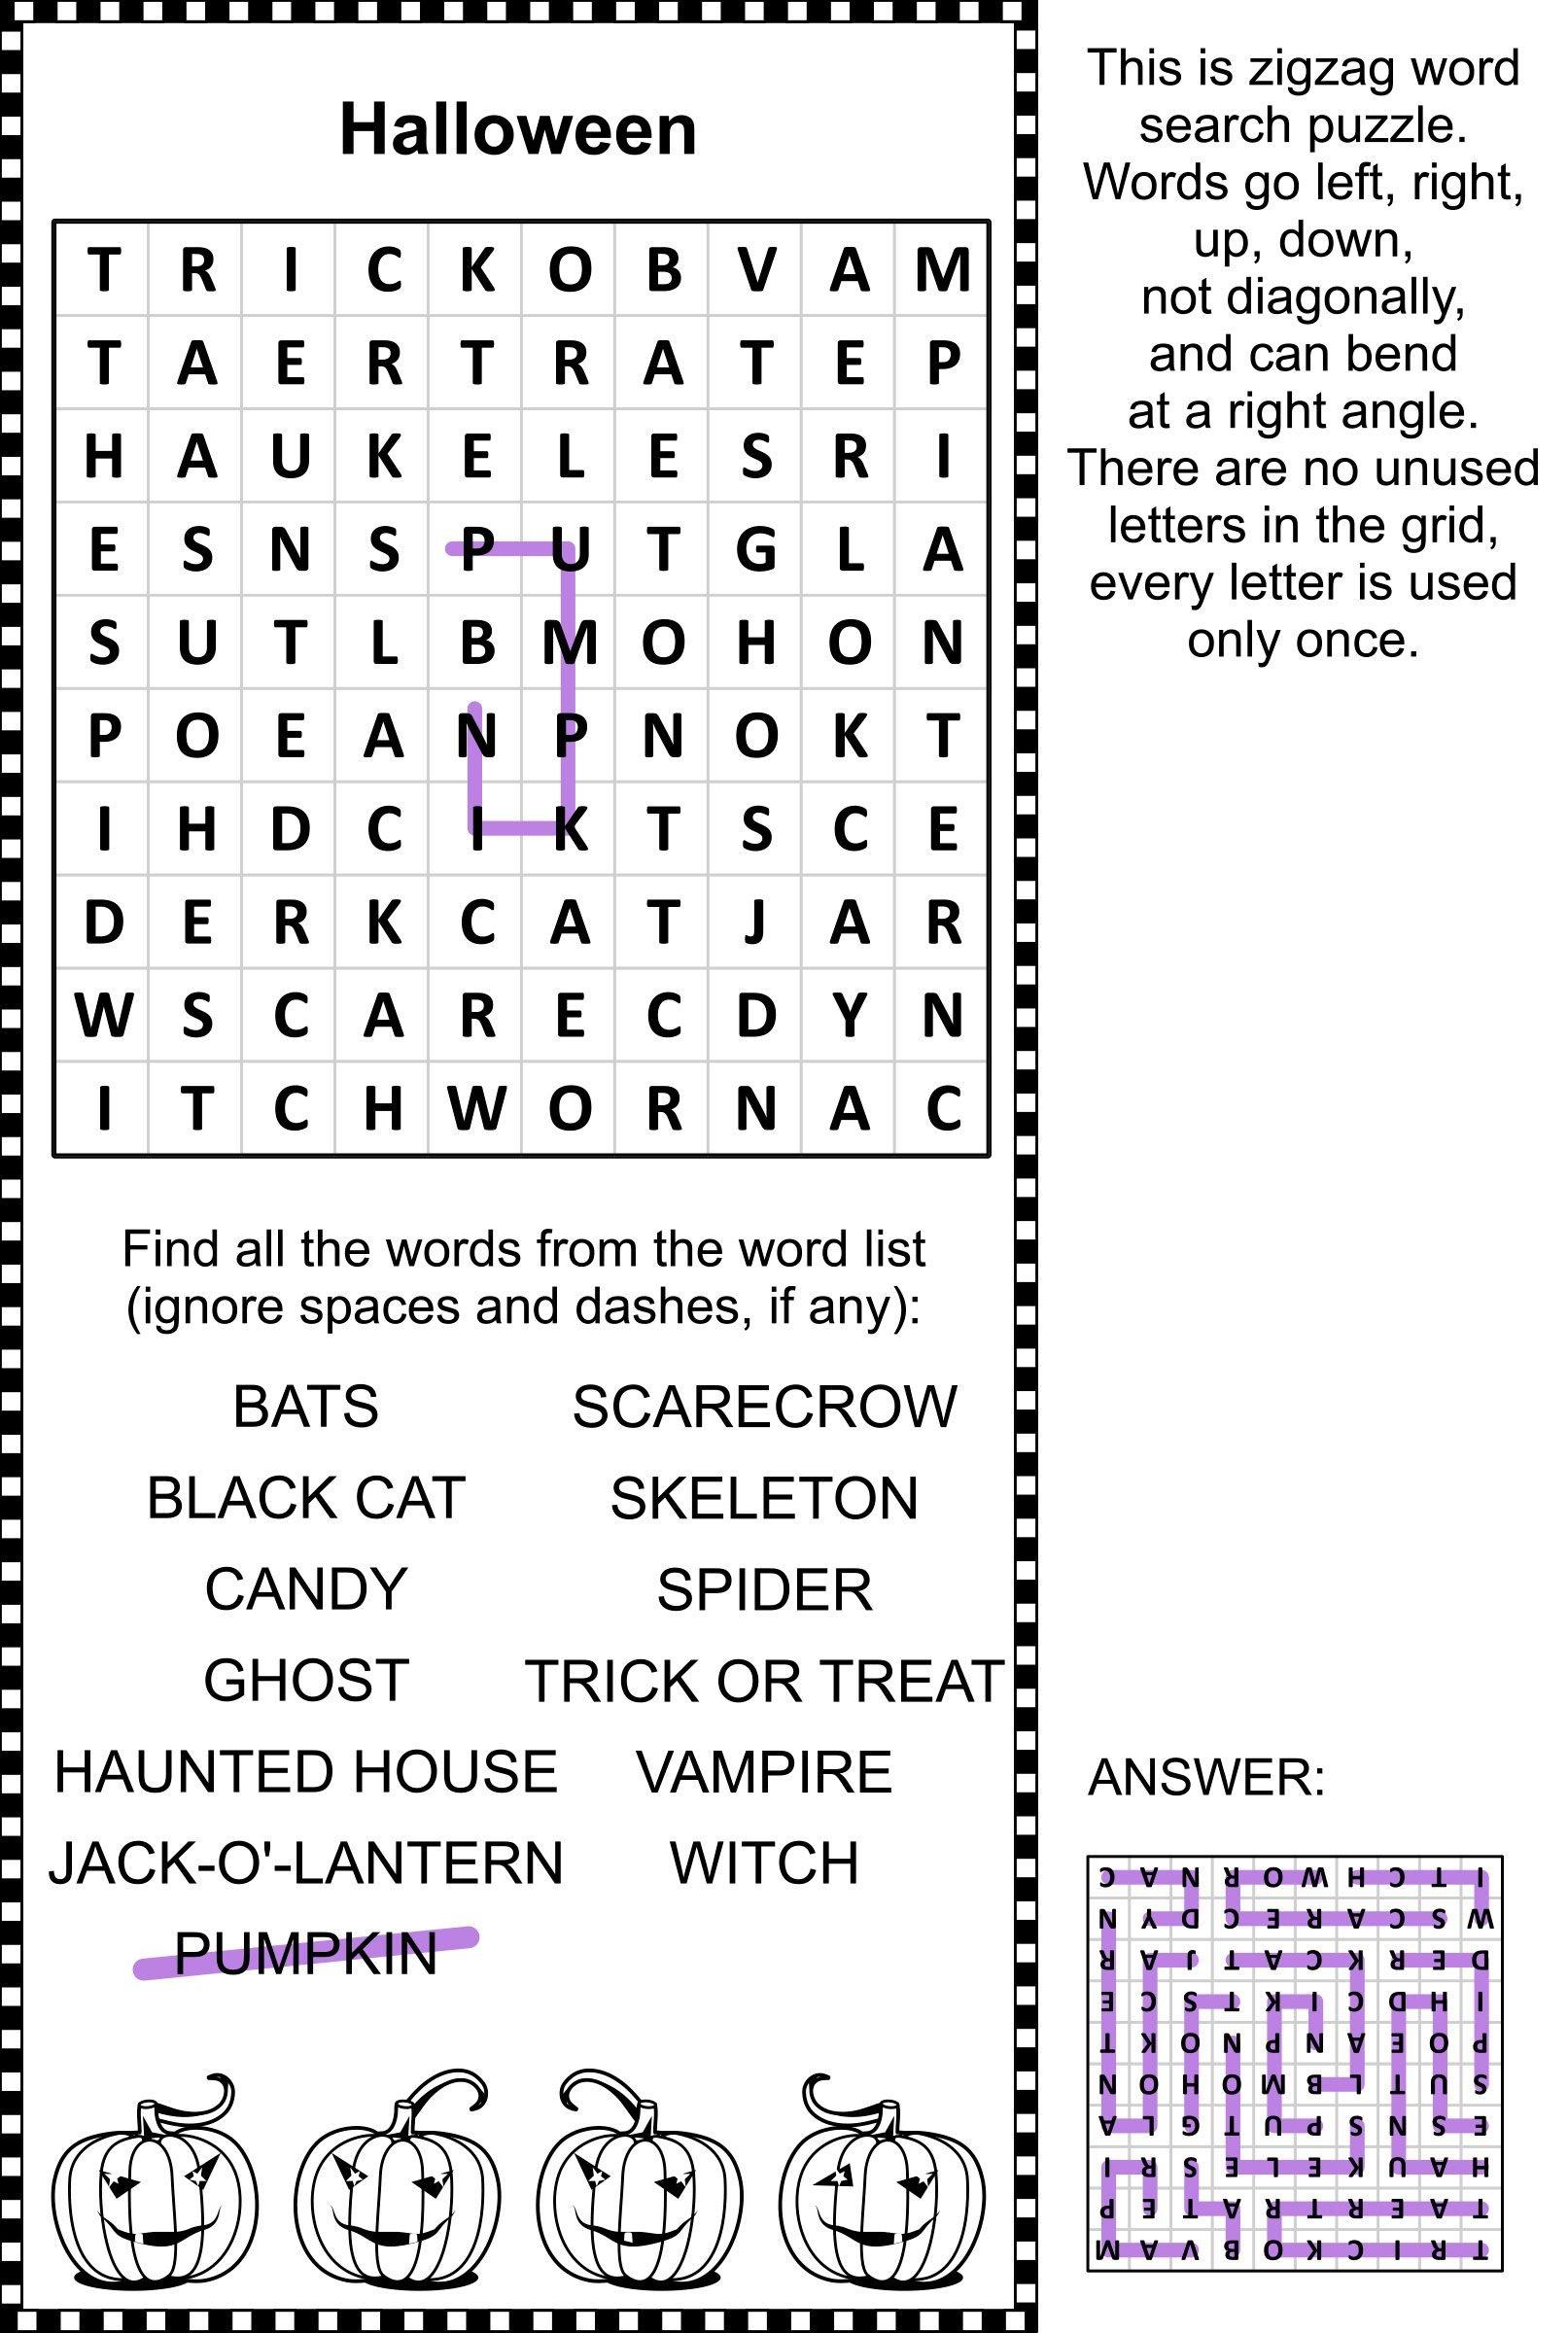 halloween zig zag word search puzzle